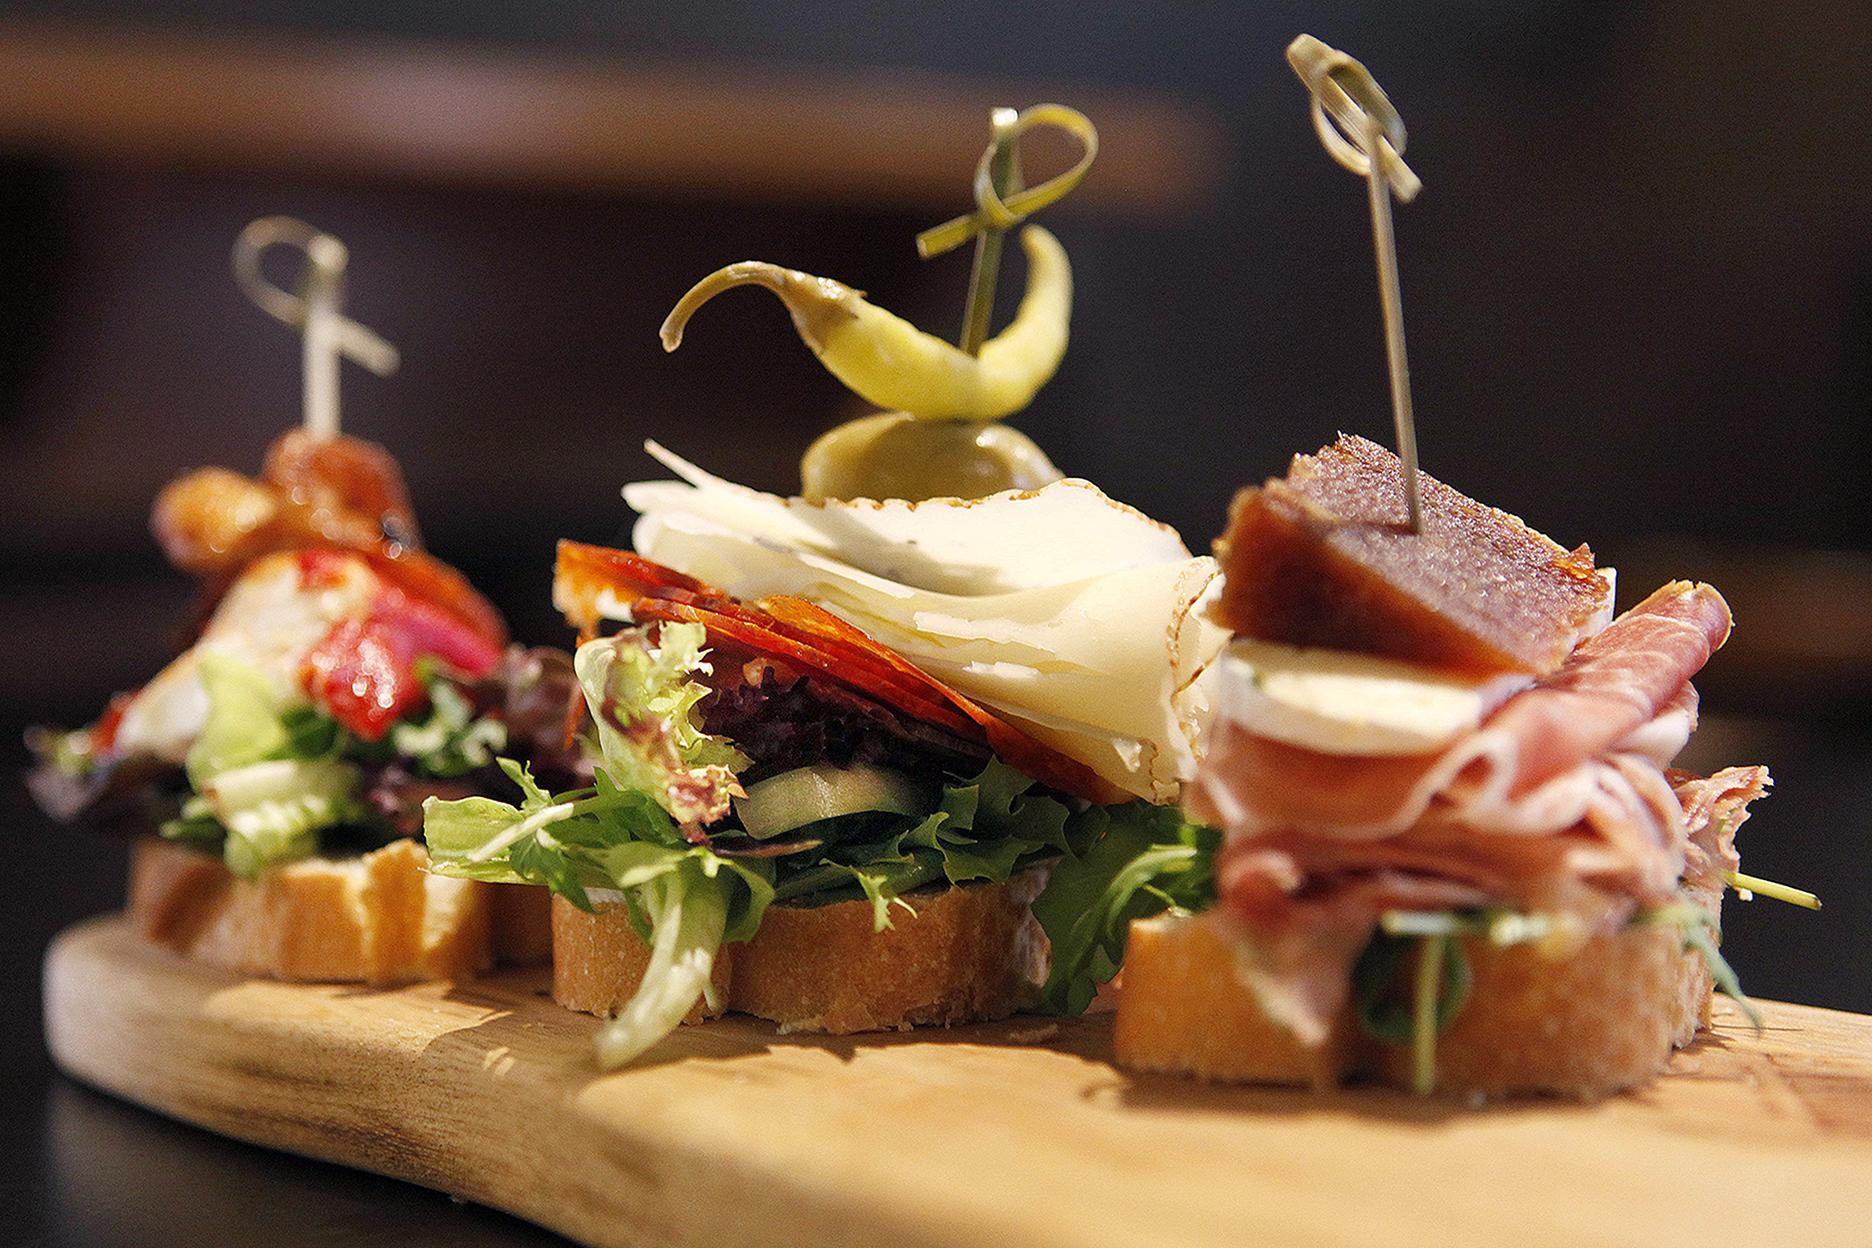 CHP_Export_123128259_SA Weekend review - La Rambla Tapas Peel St [PIC] Tapas on bread - Gambas con p.jpg